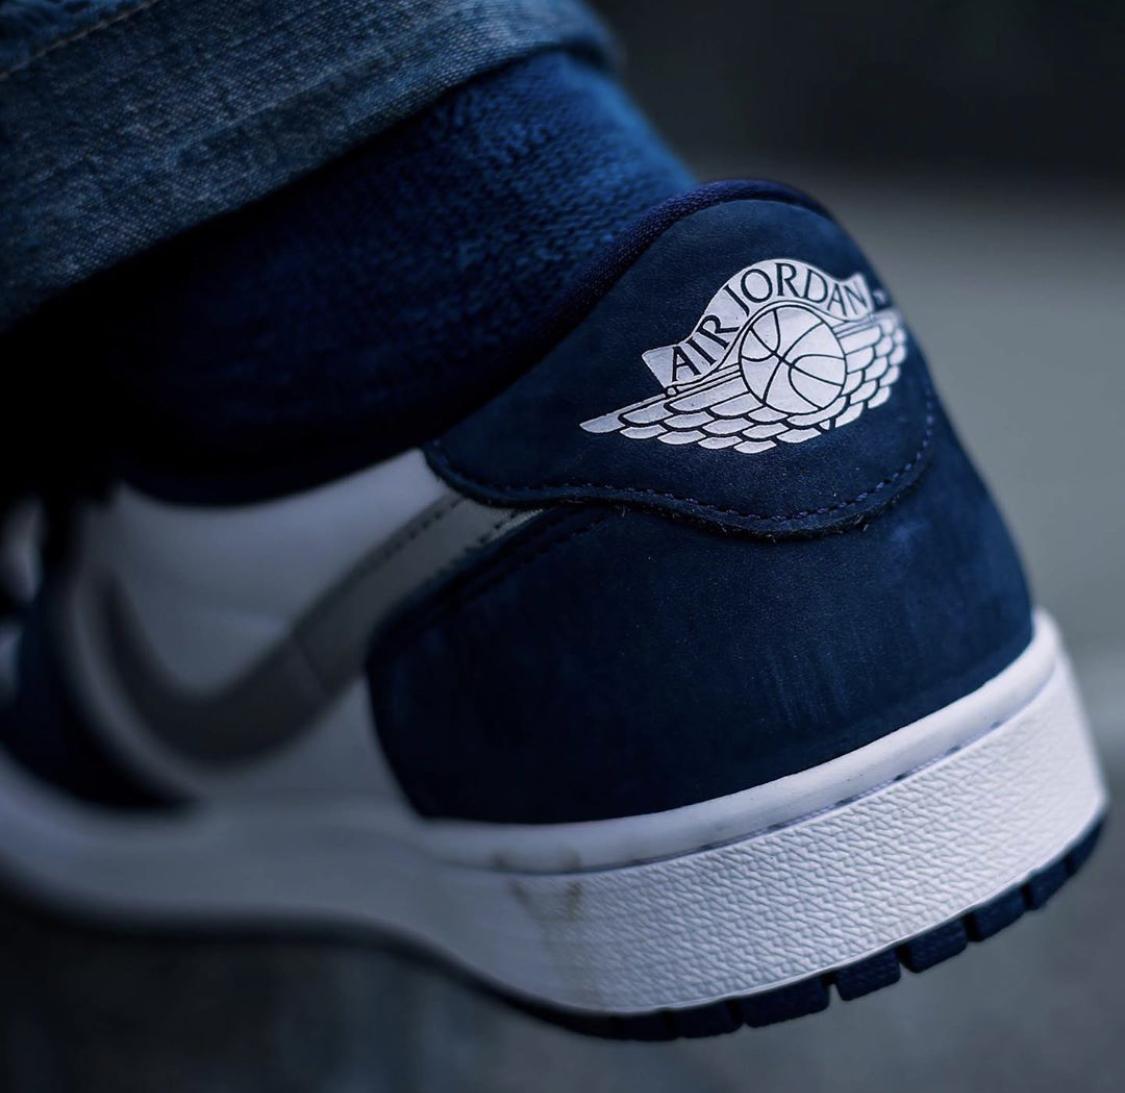 f:id:sneakerscaffetokyo:20190612175011j:plain